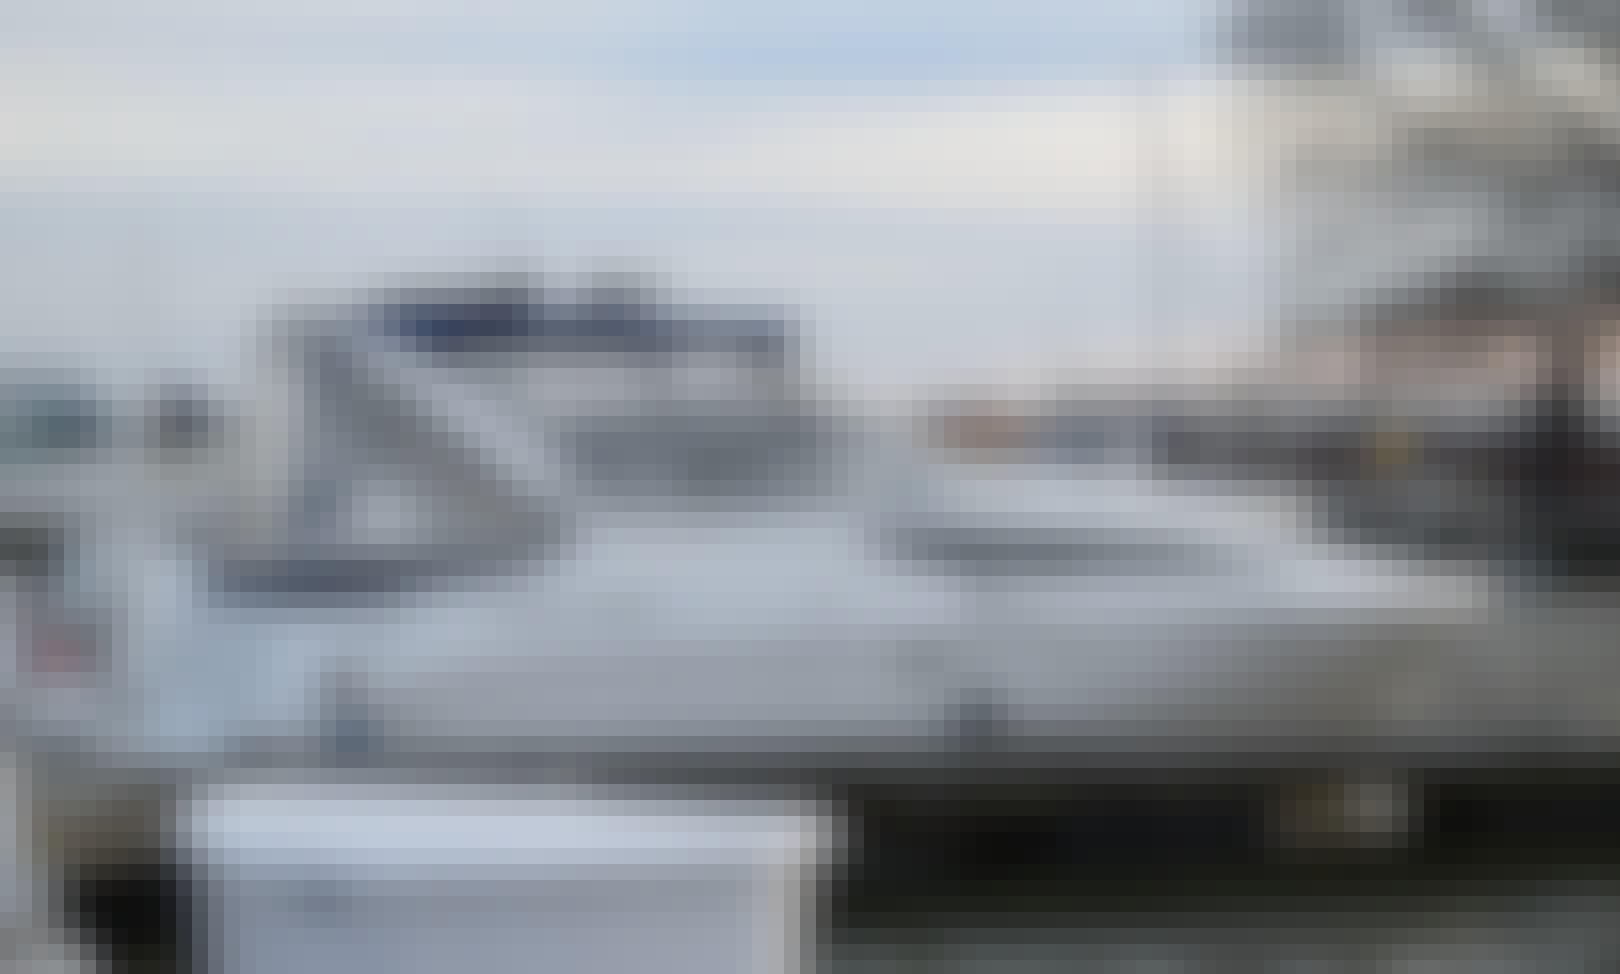 Comfortable cabin cruiser on the Potomac River in Washington, D.C.